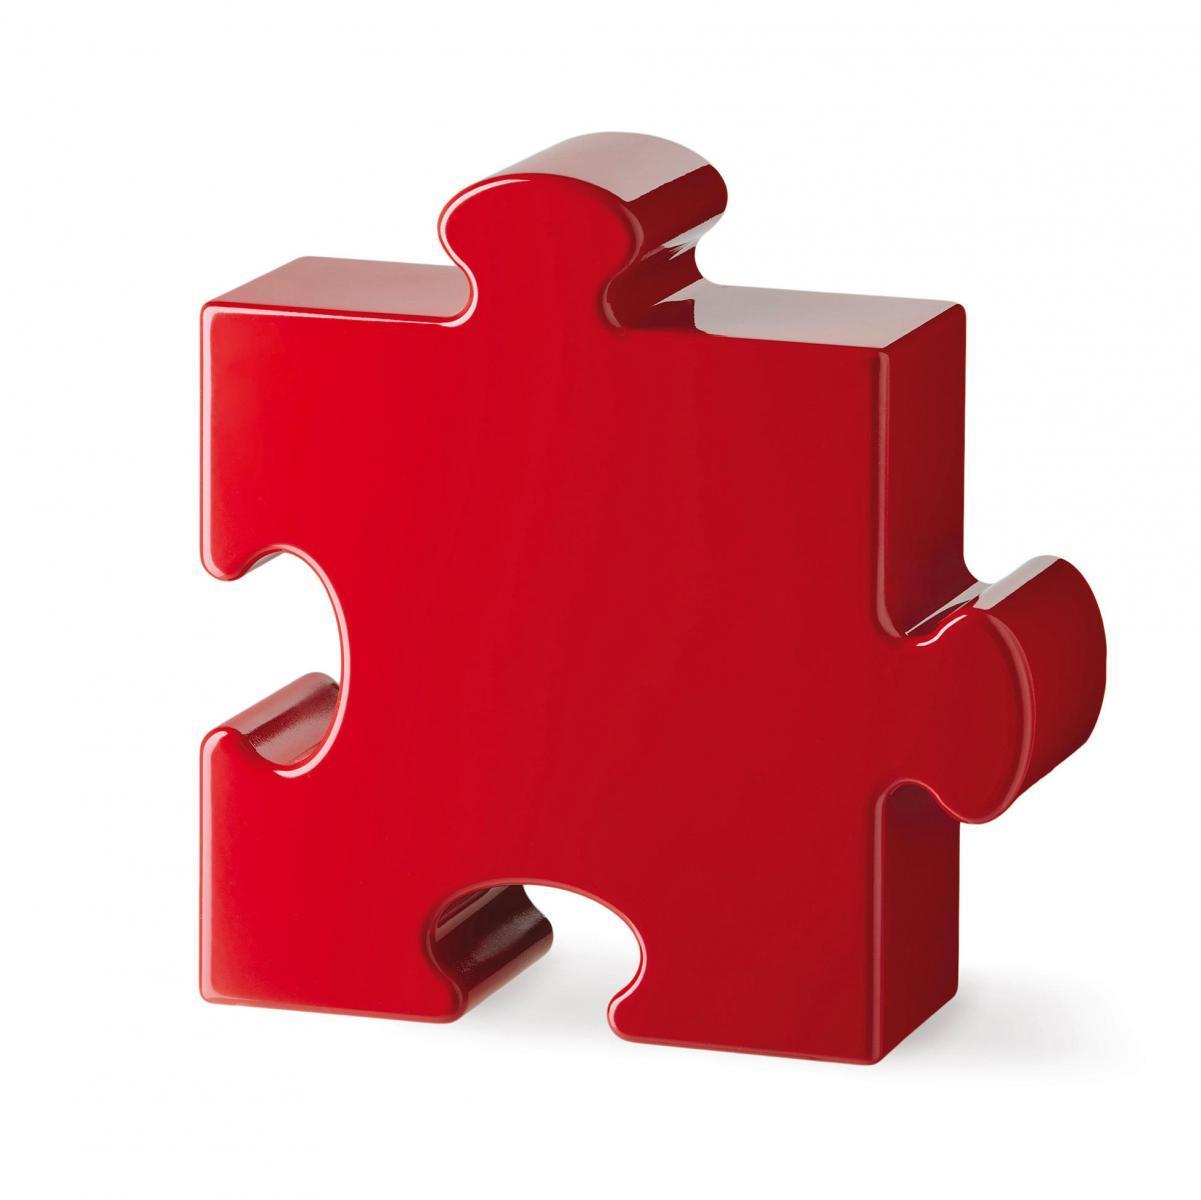 Пластиковая фигура пазл Puzzle Standard